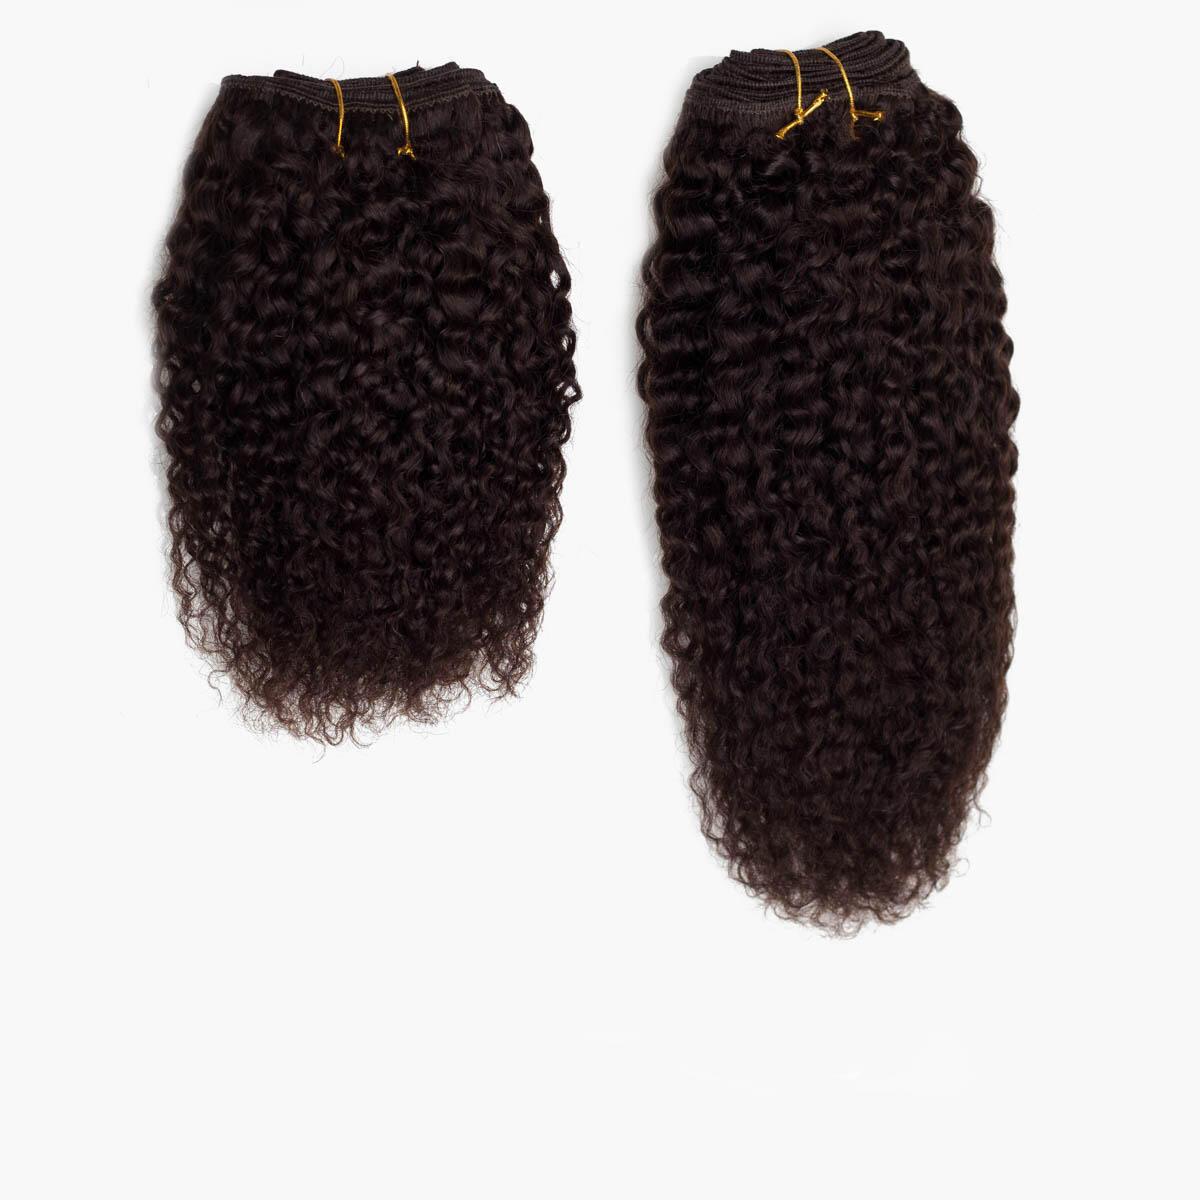 Hair Weft 2.3 Chocolate Brown 25 cm